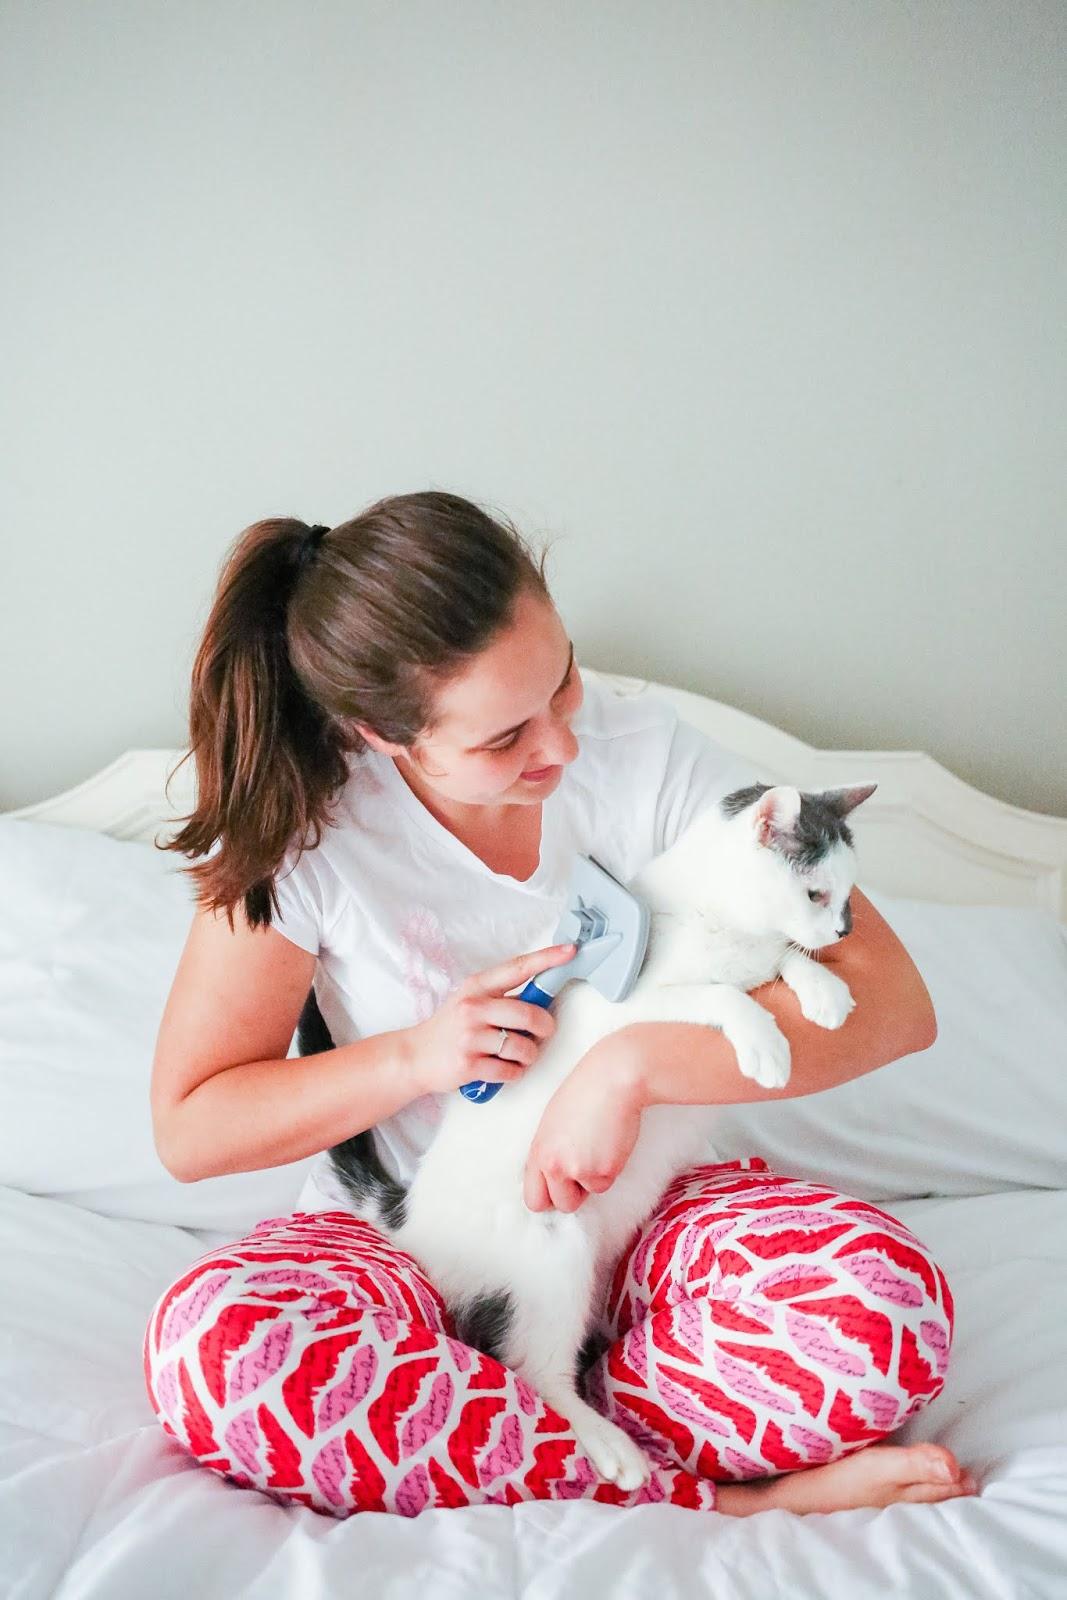 Brunette girl wearing victoria's secret pajamas grooming her white elderly cat